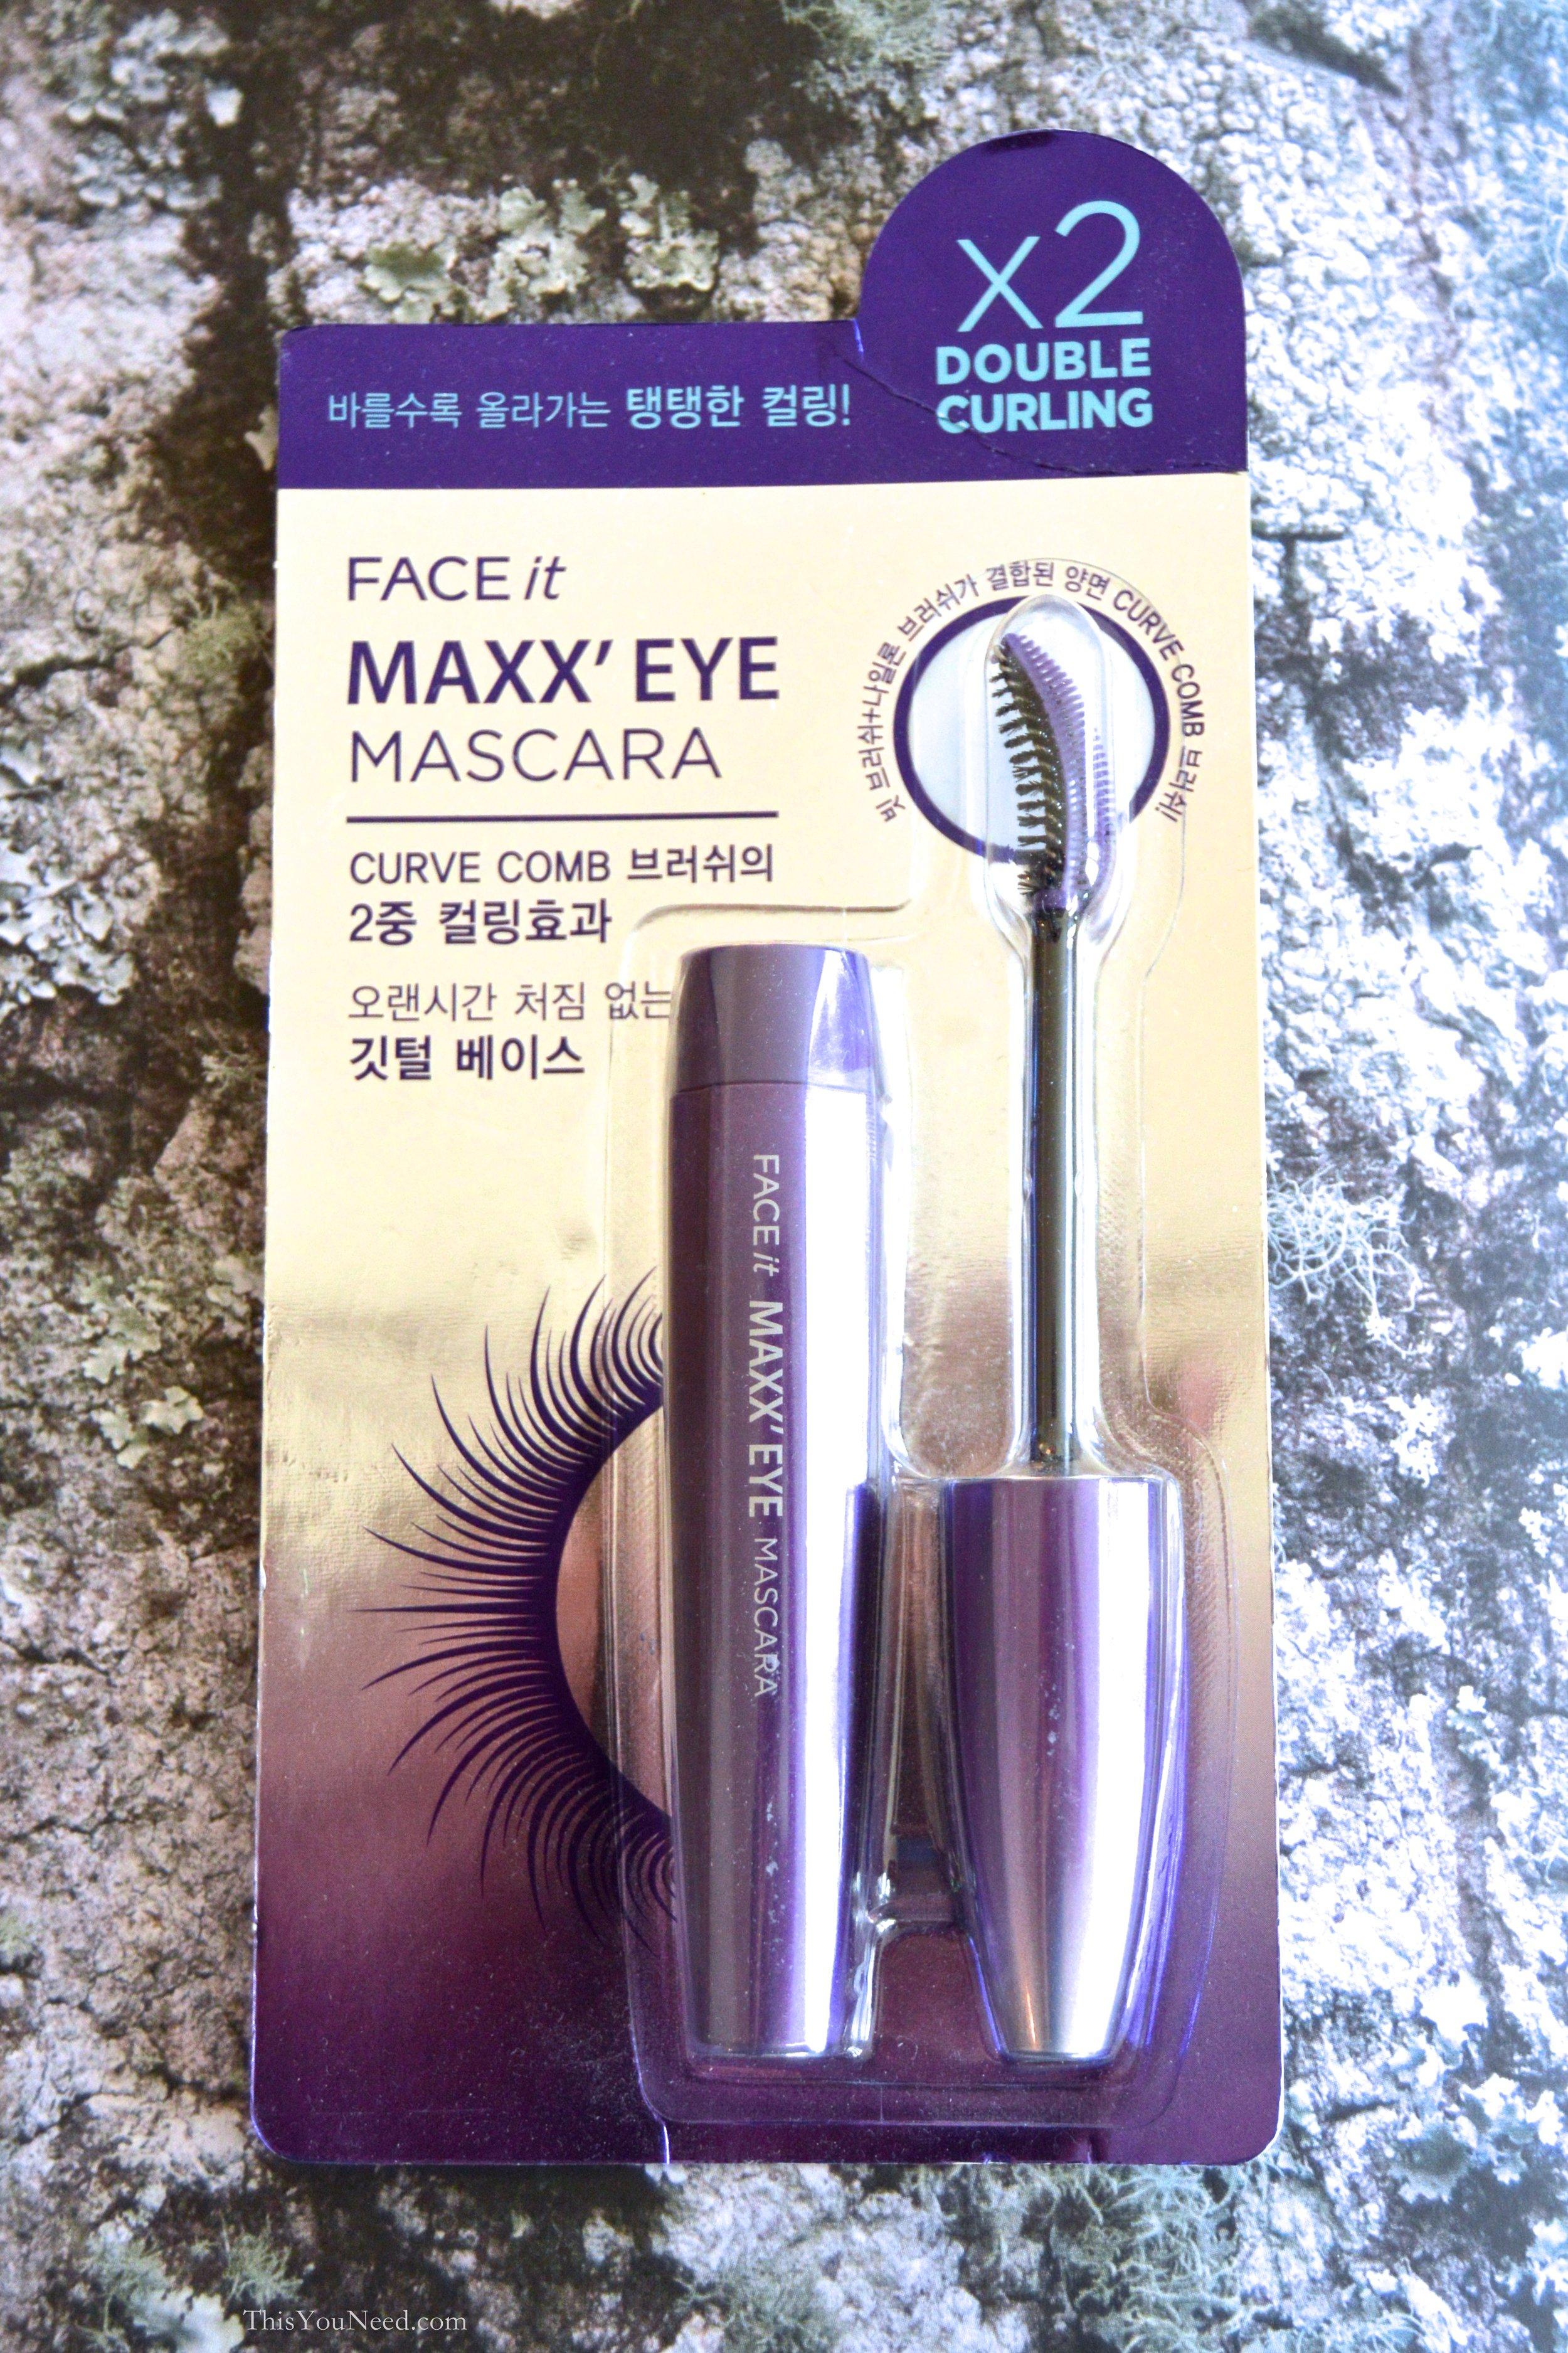 Face-Shop-Mascara-Package.jpg